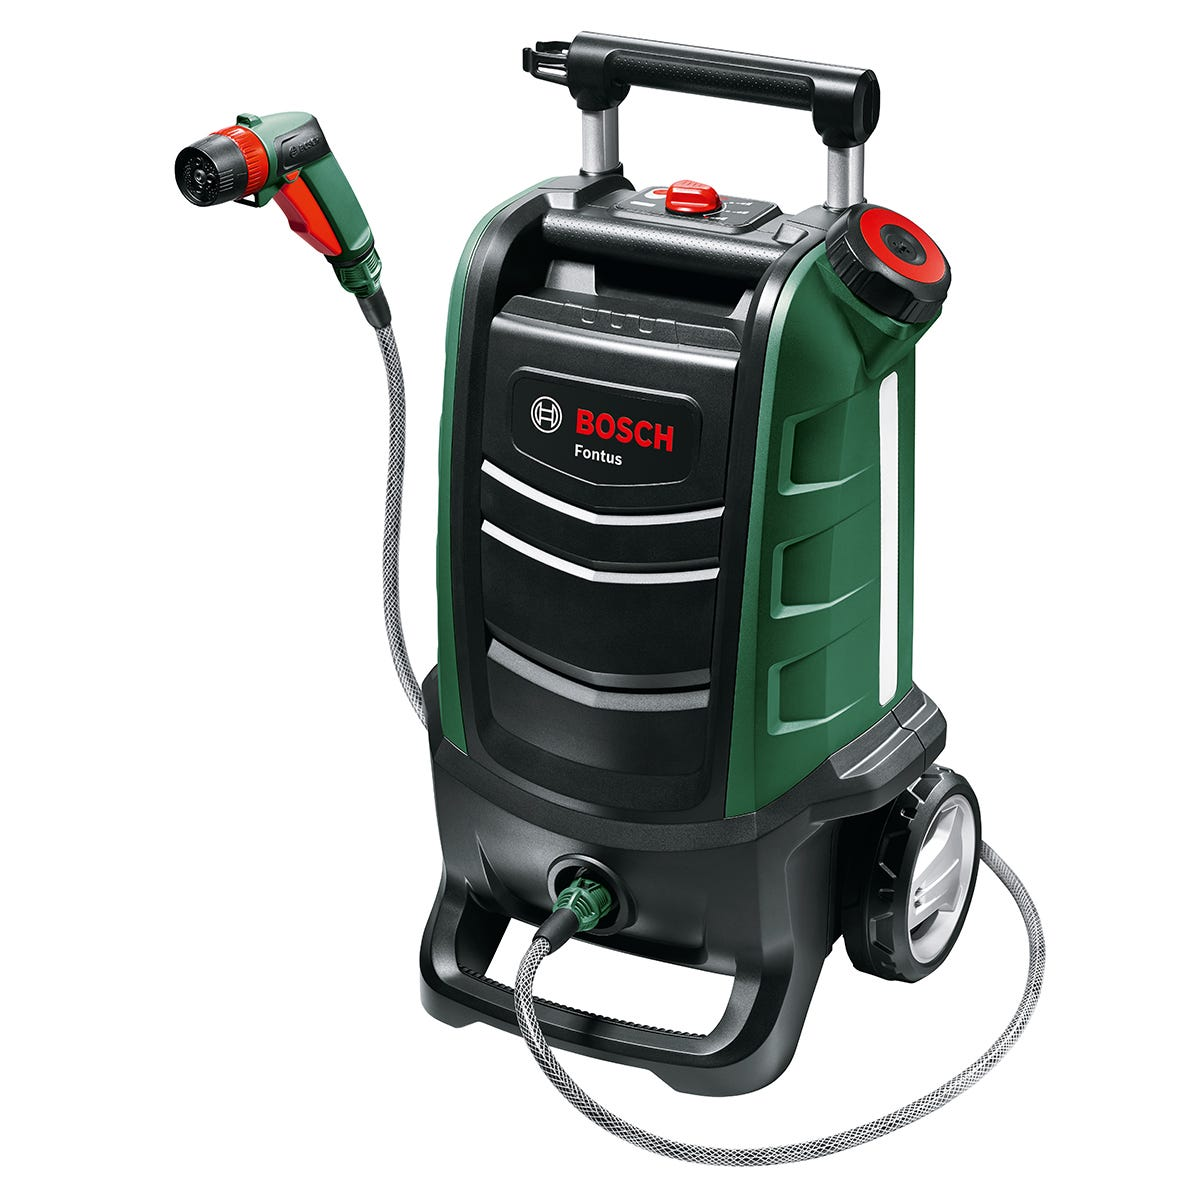 Bosch Fontus Portable Pressure Washer